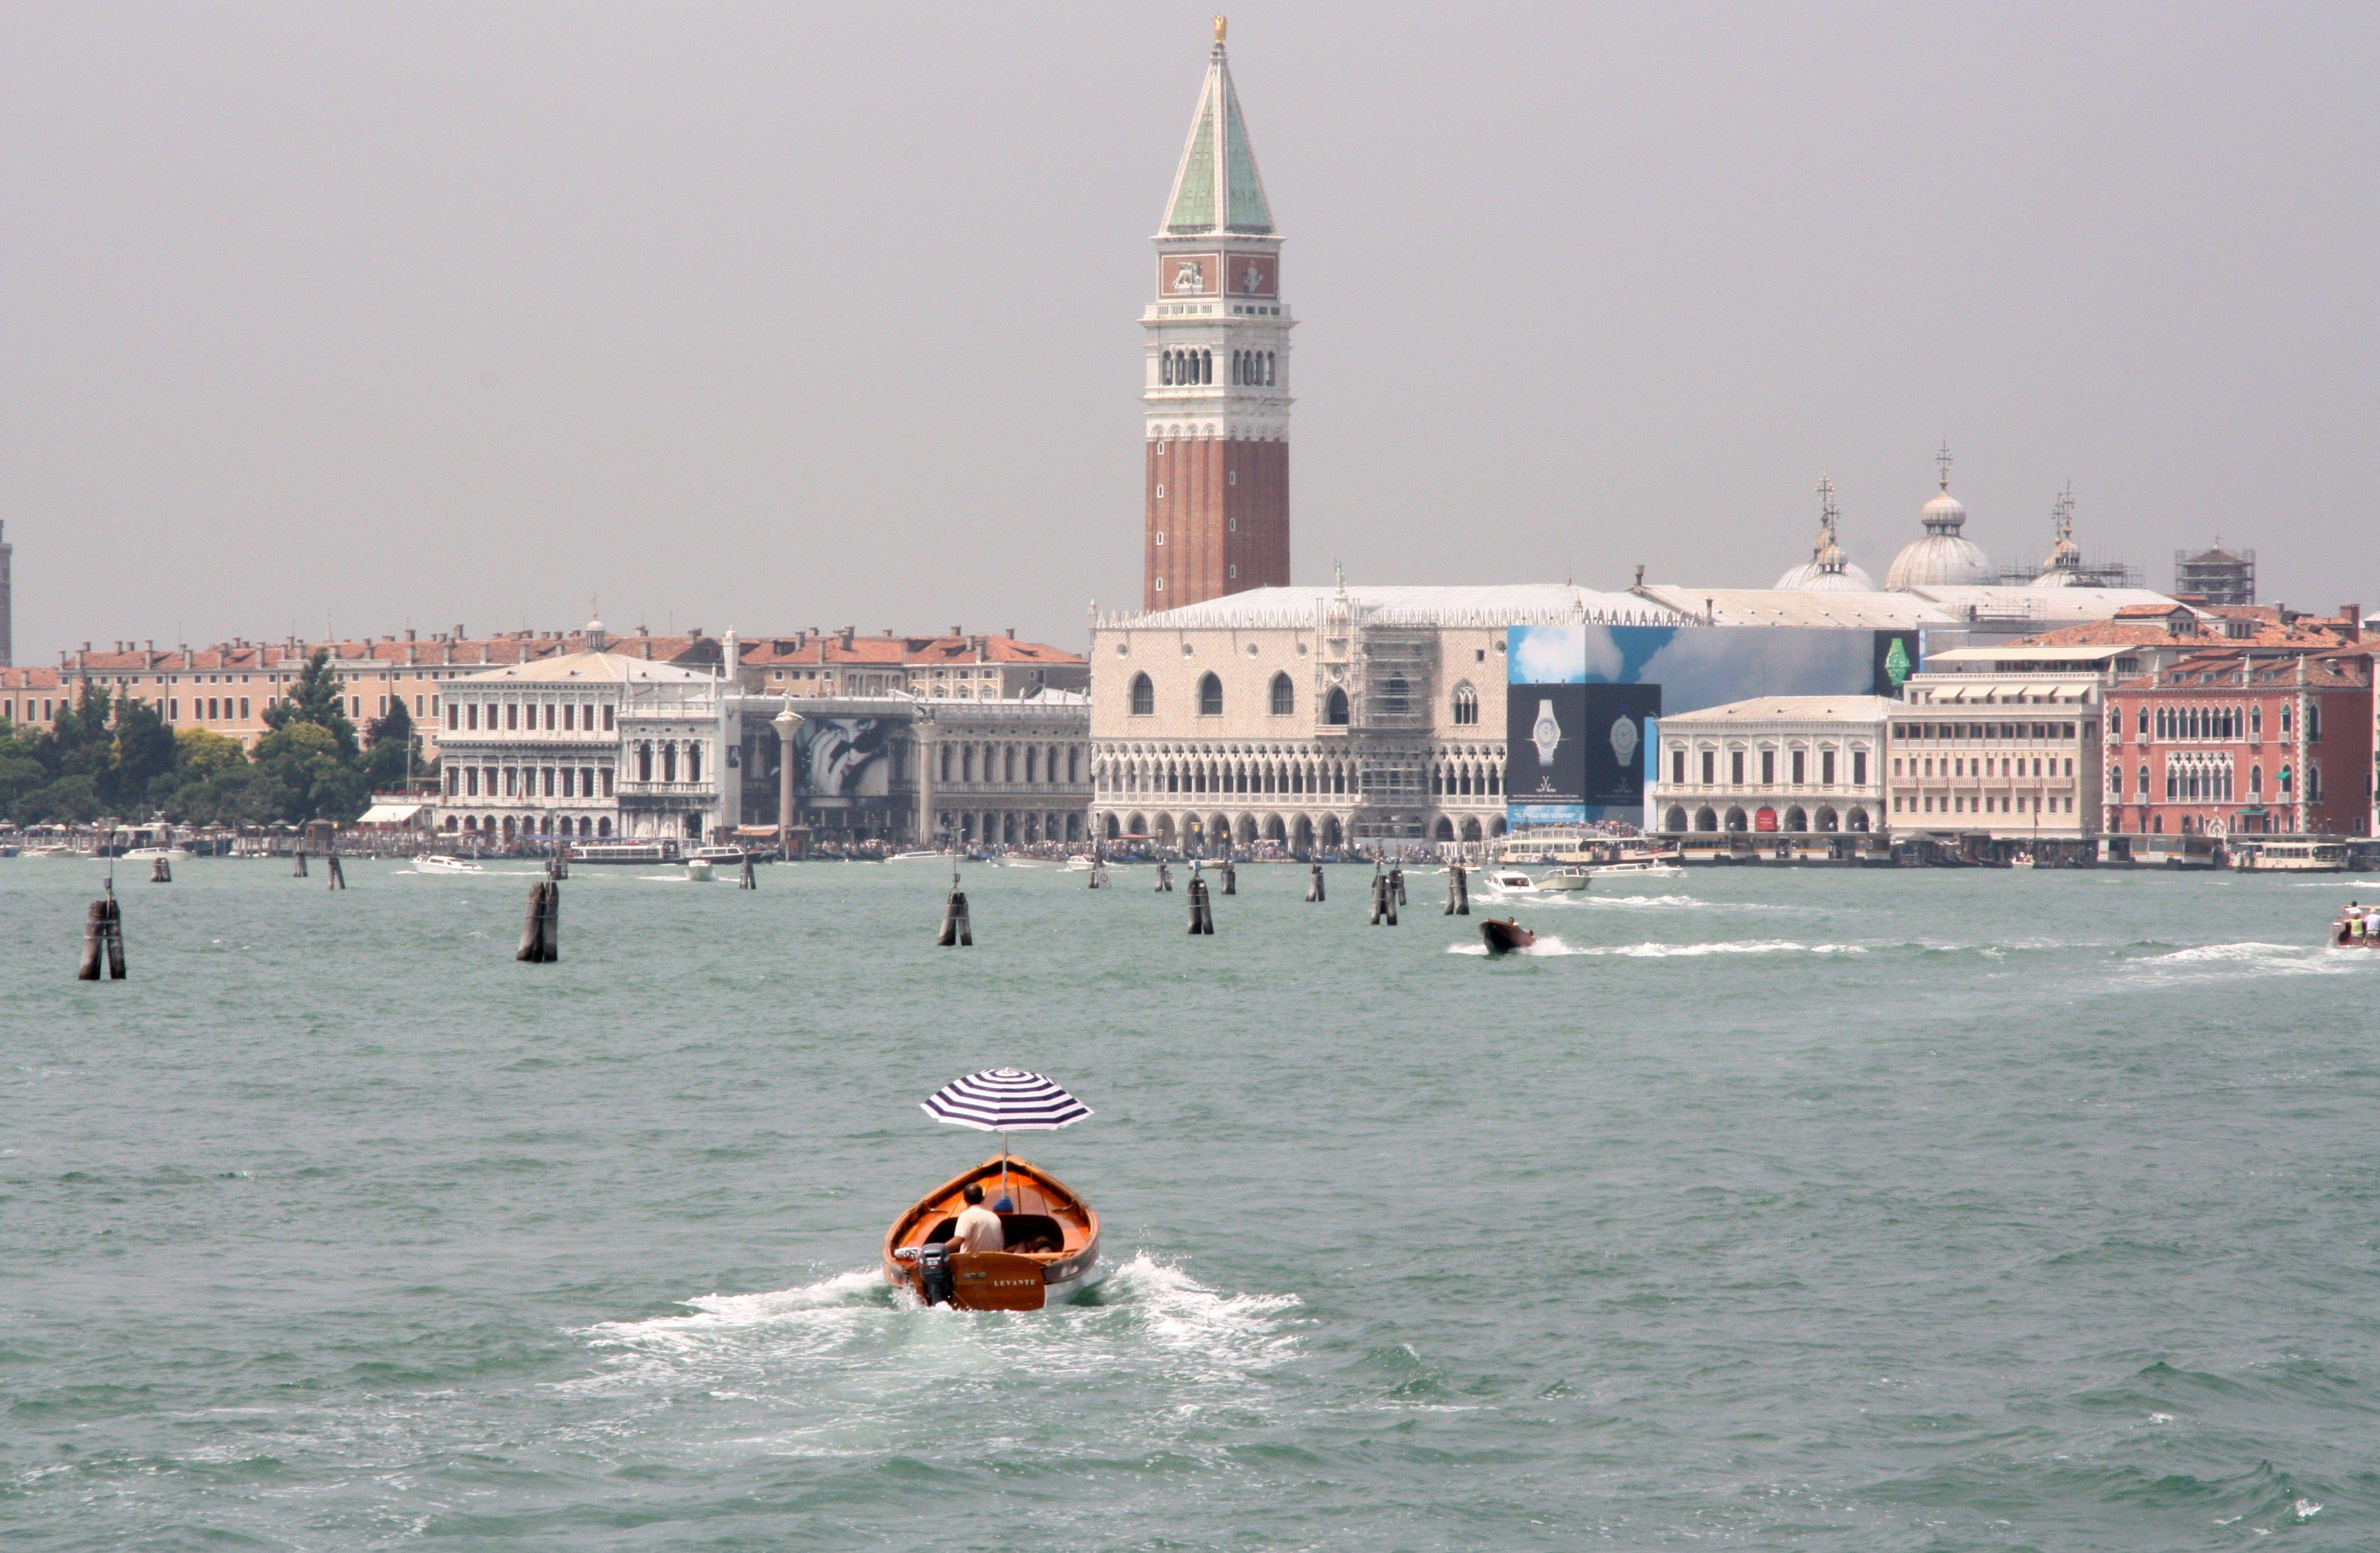 Venice, Italy (photo by Breda Drevenšek)